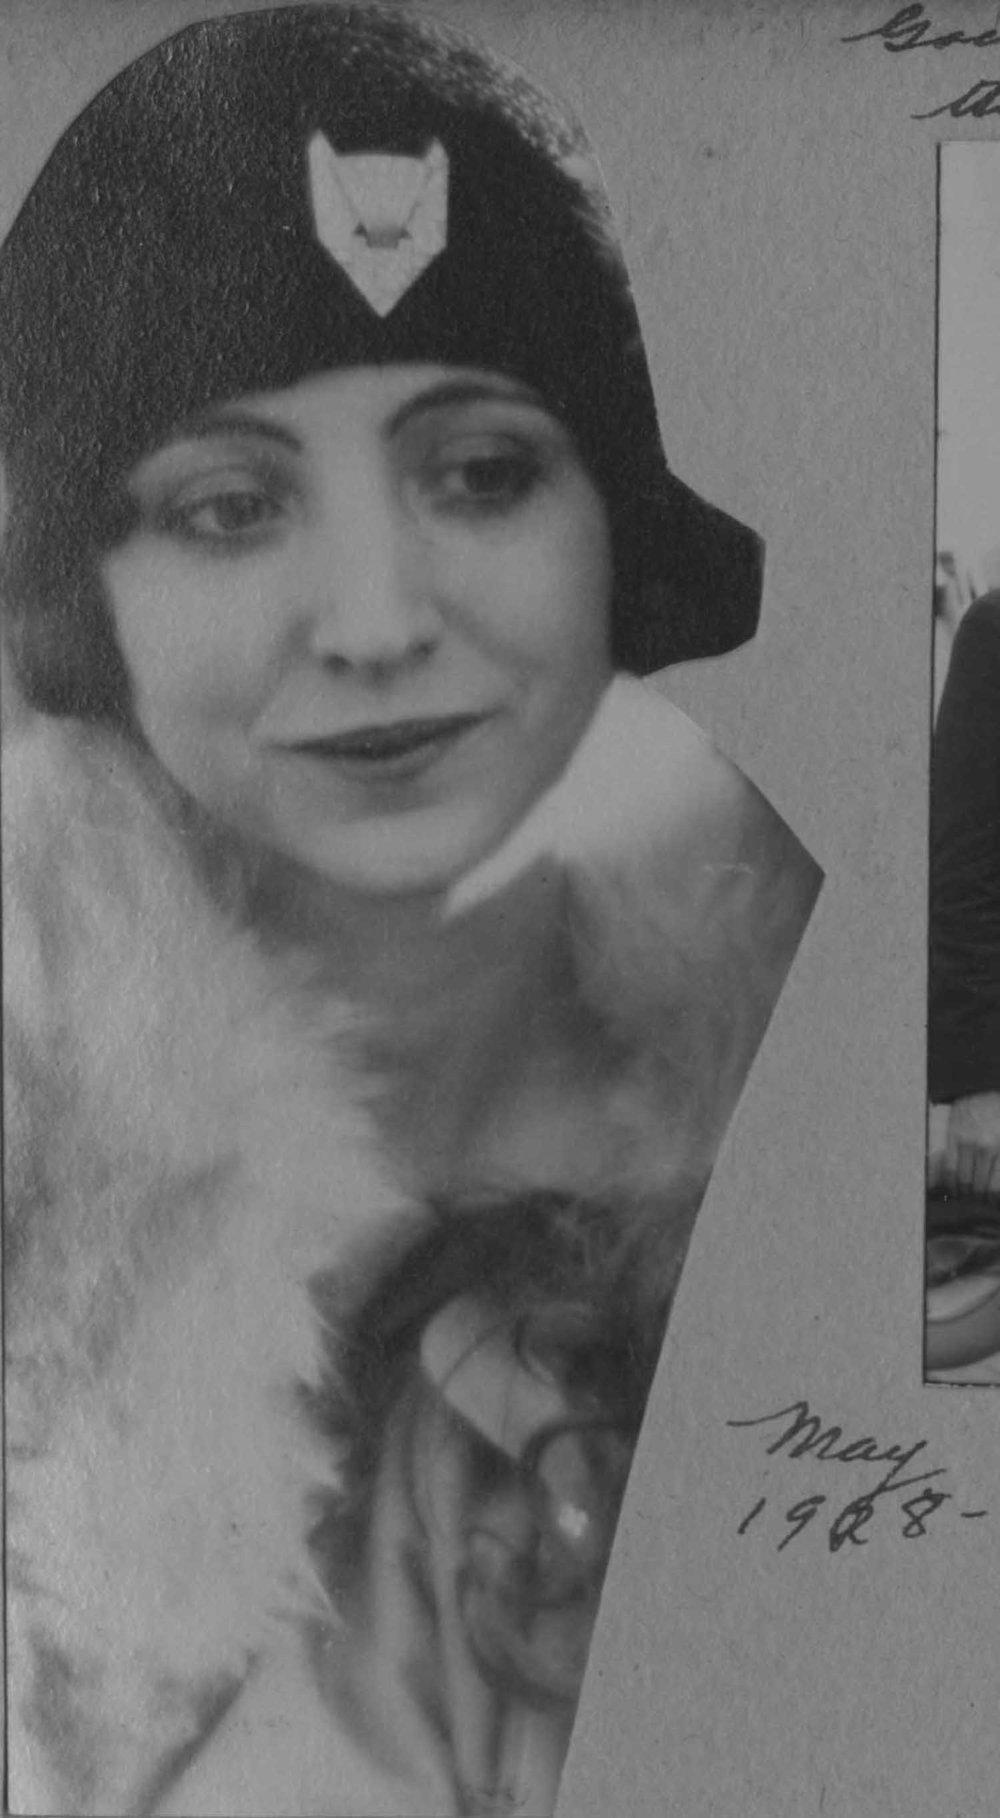 Anais 1928 8 May NY.jpg